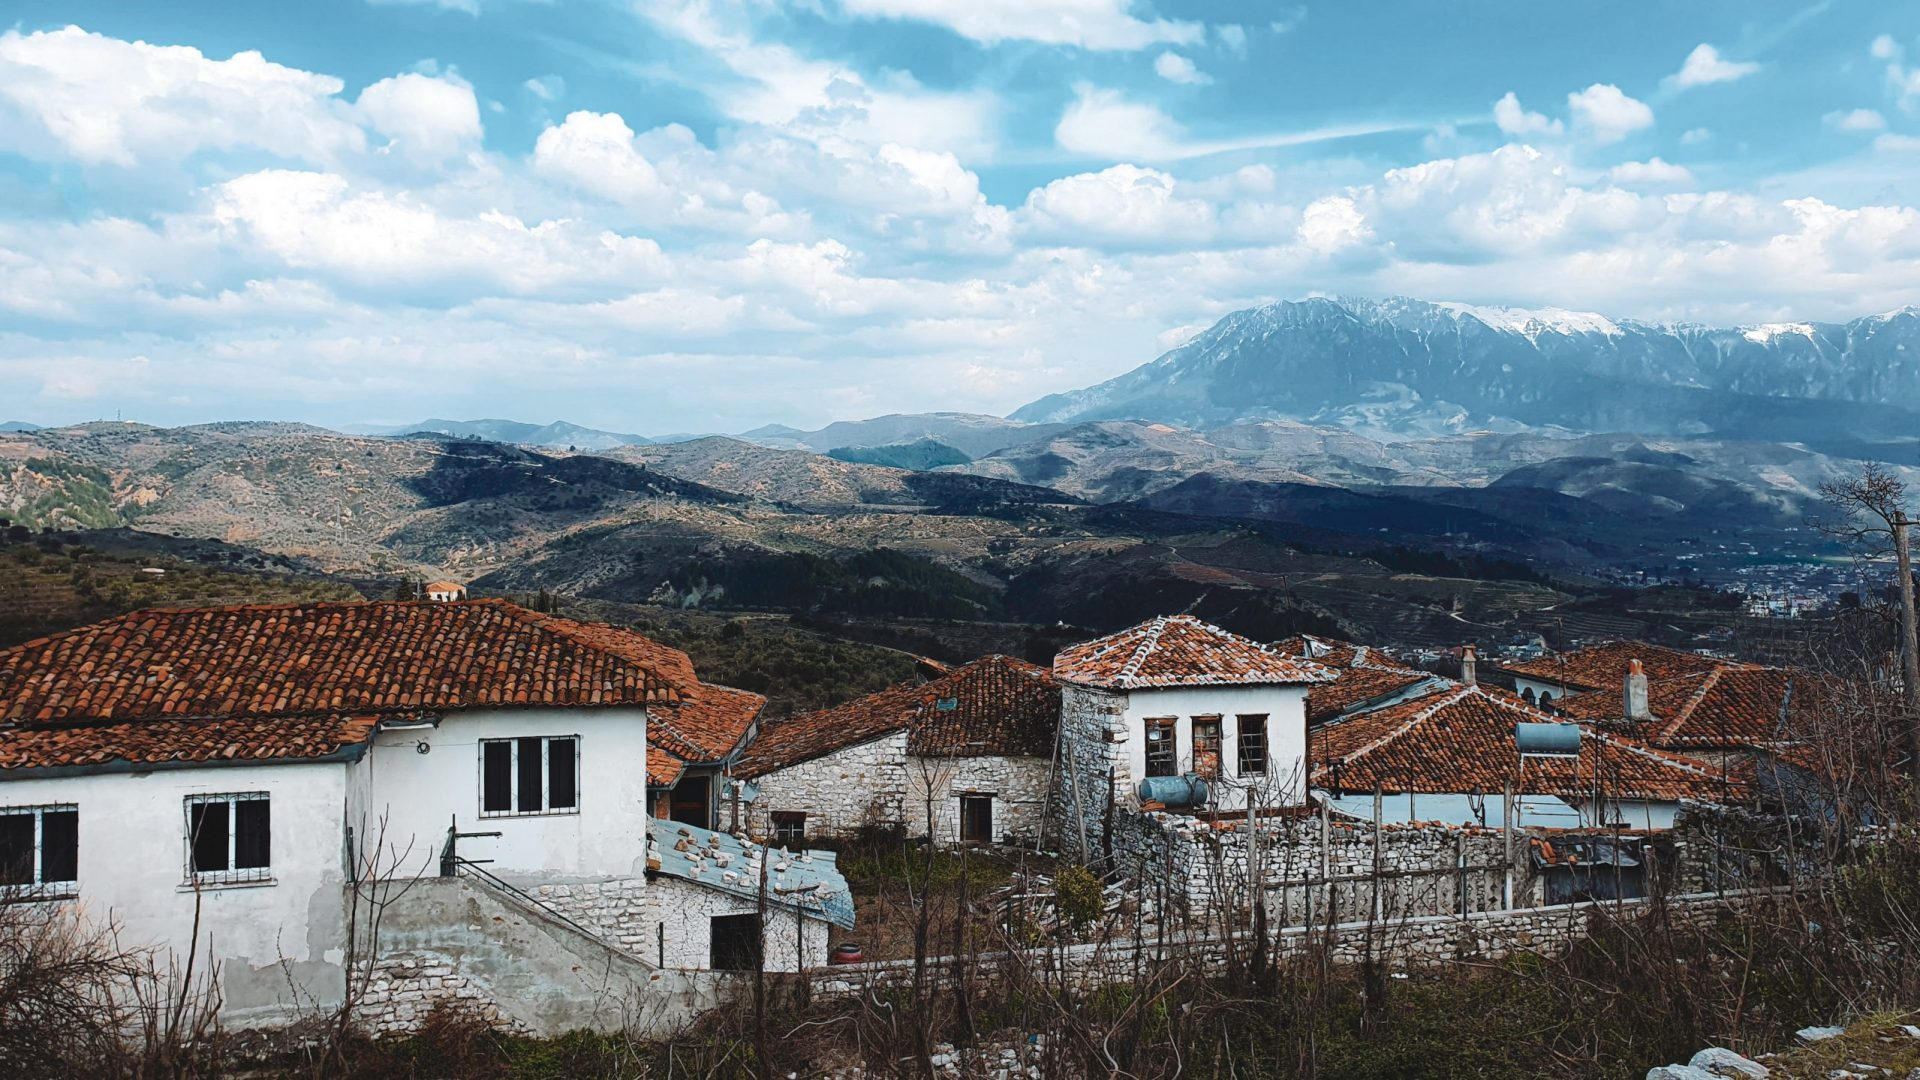 Vakantie Albanië? Must know: van highlights tot reisadvies header